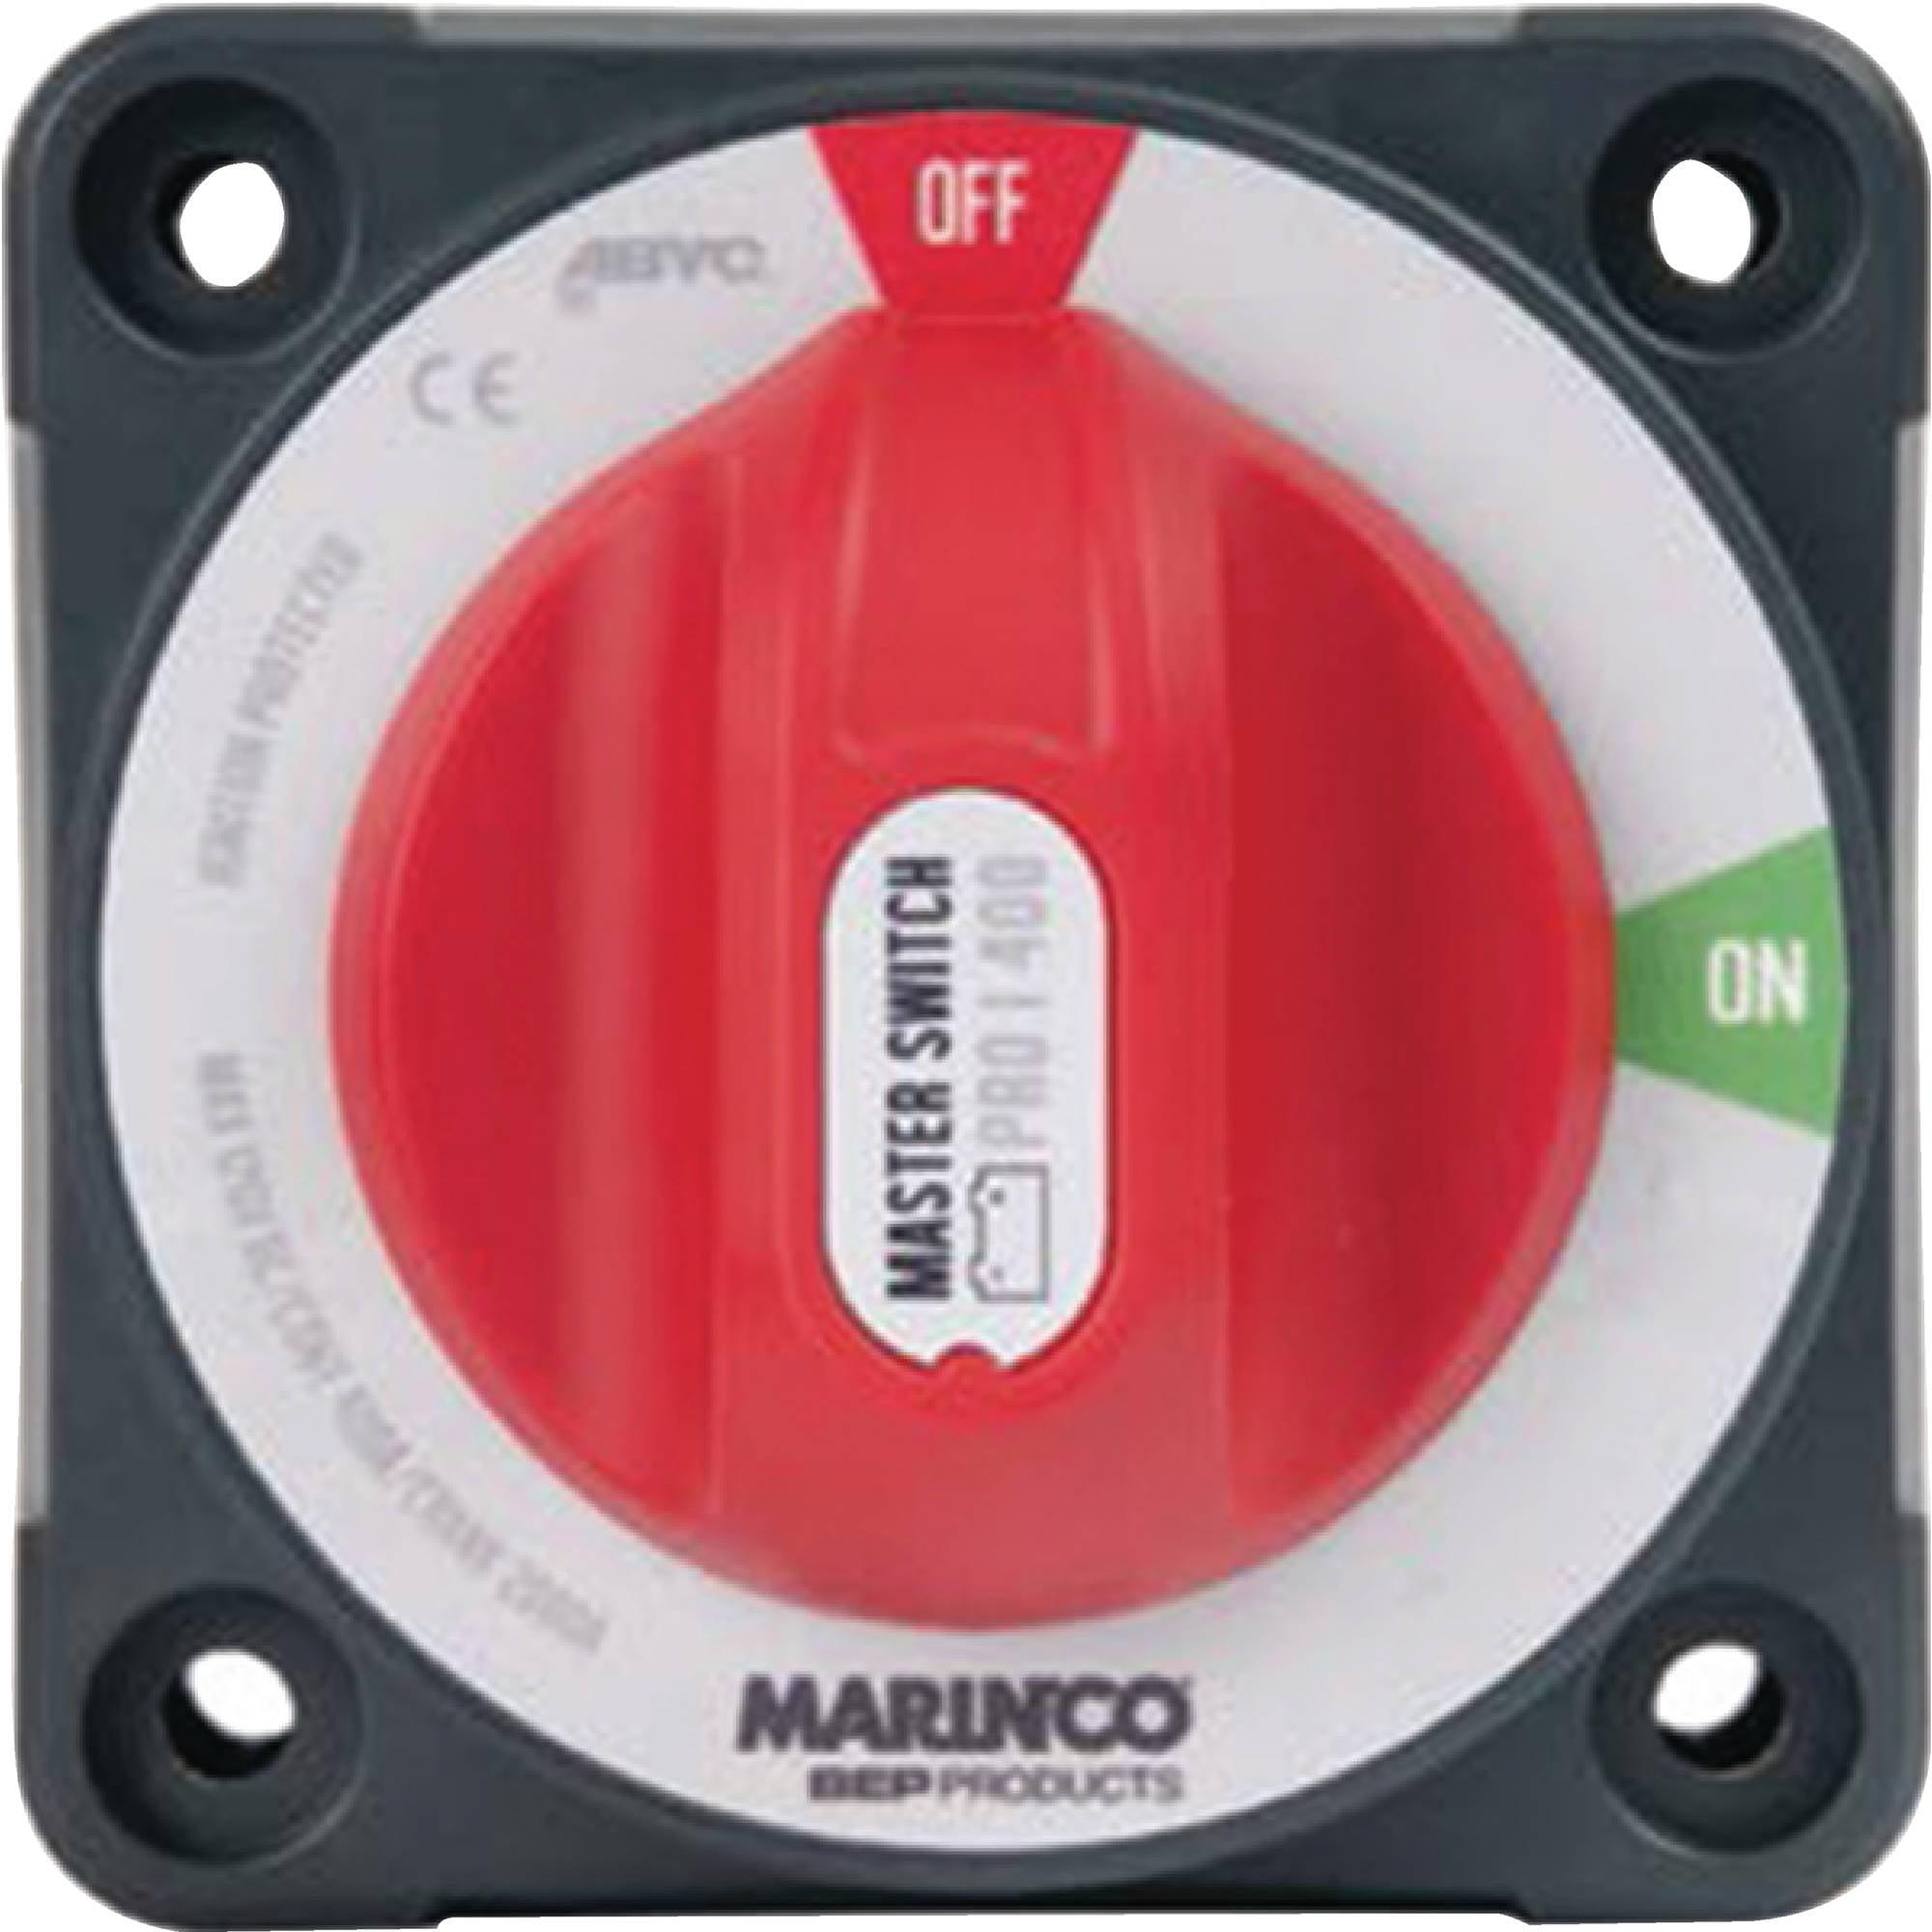 Marinco 770-DP Pro Installer Double Pole Medium Duty Battery Switch